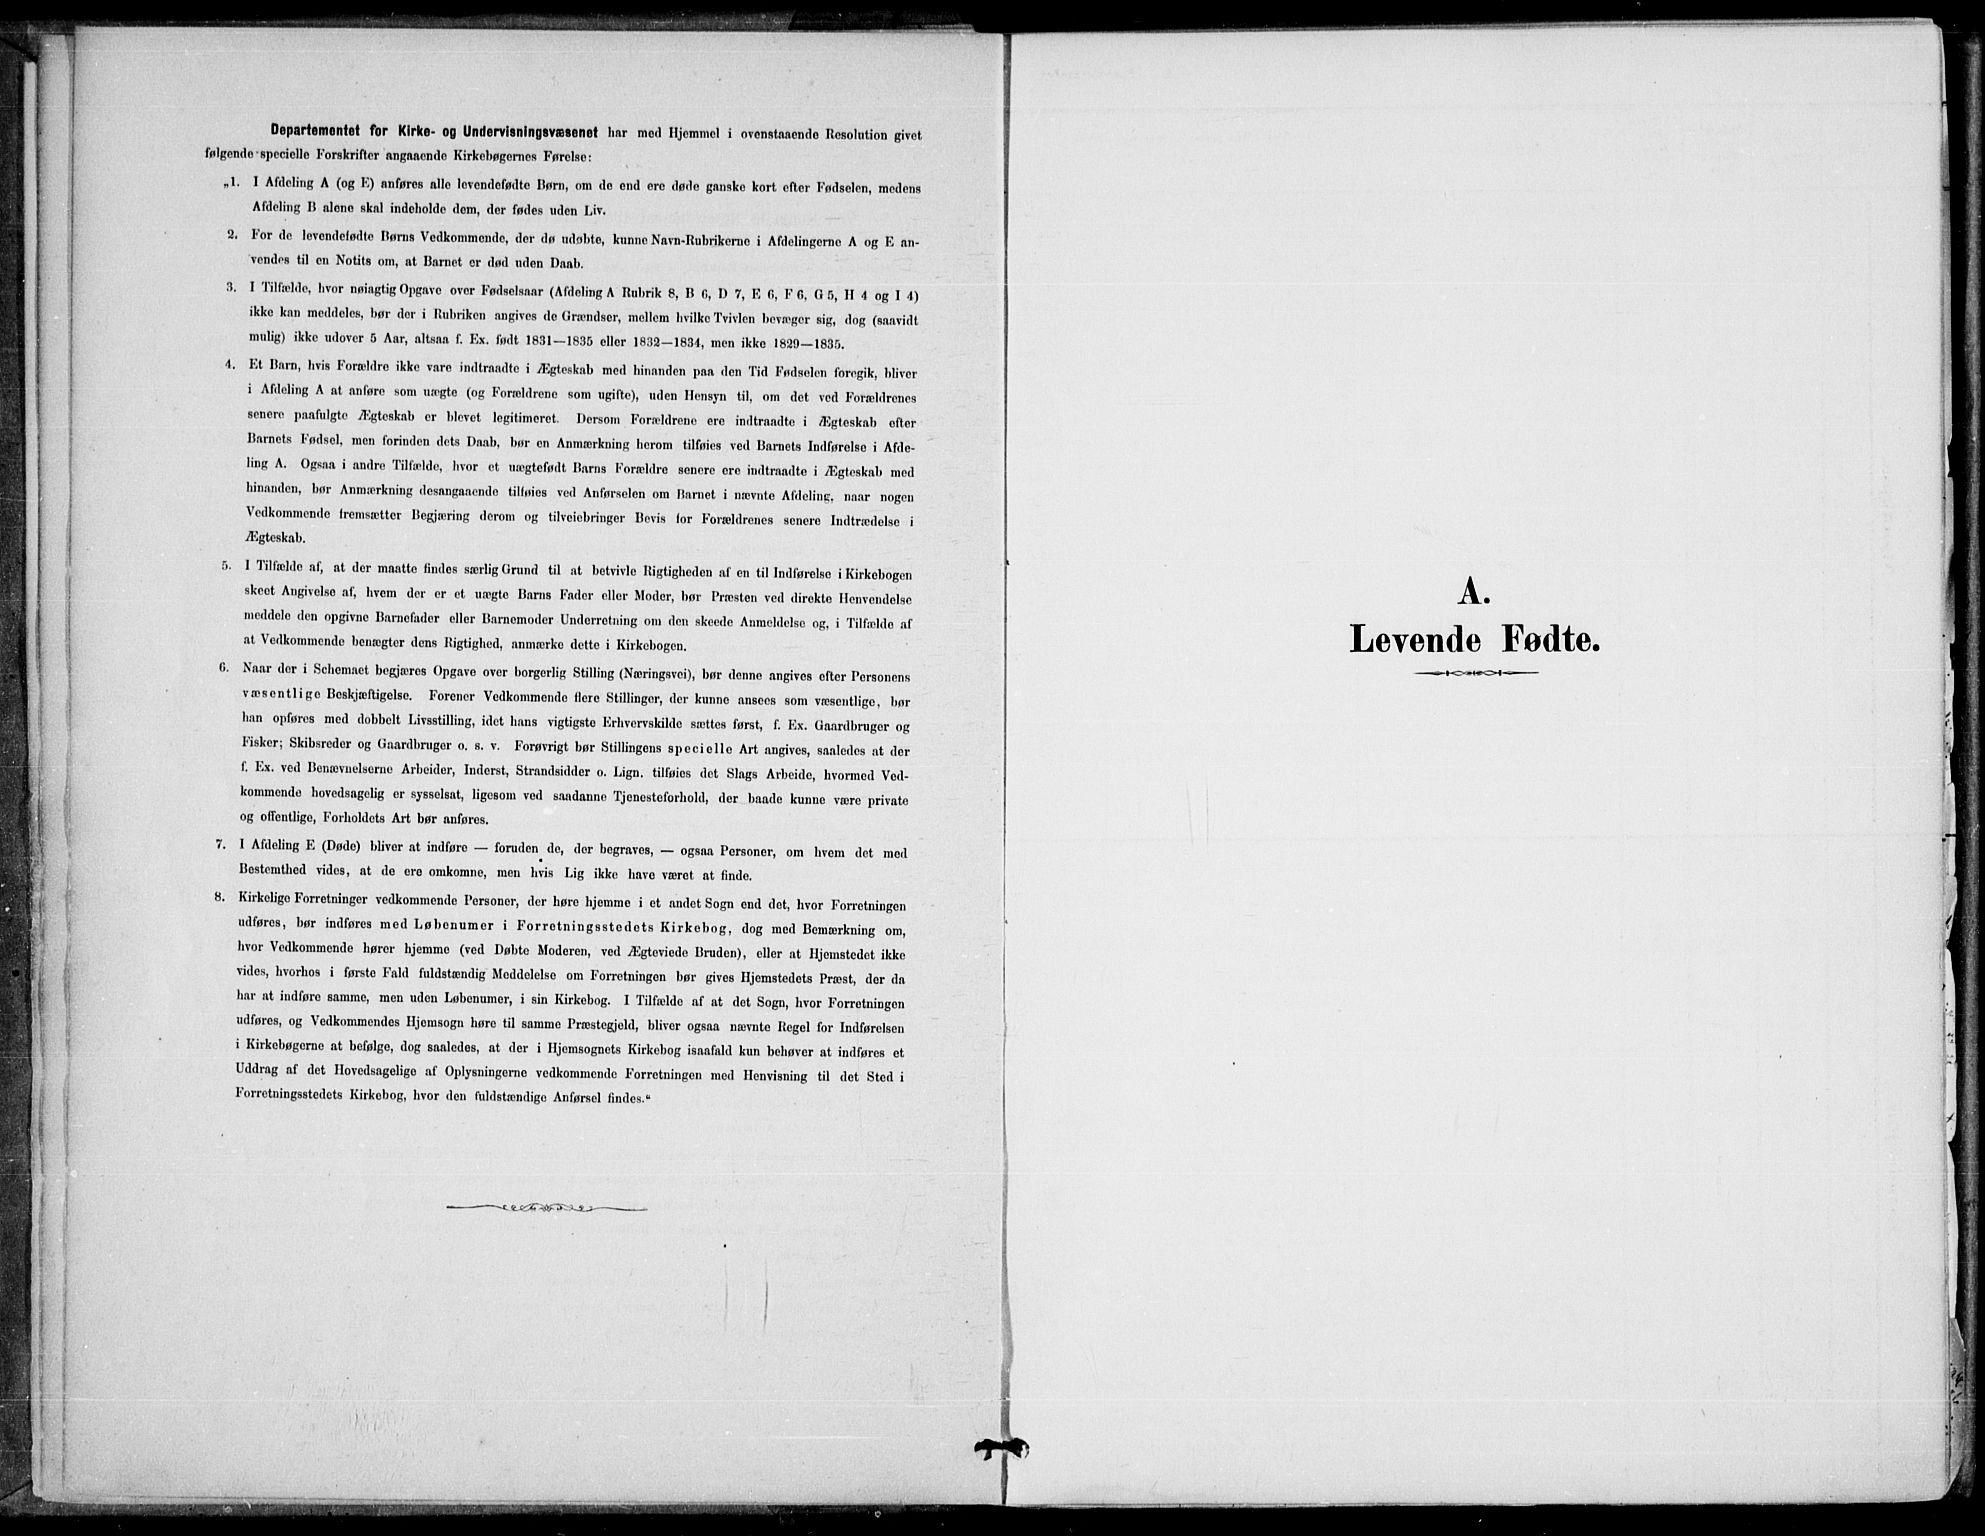 SAT, Ministerialprotokoller, klokkerbøker og fødselsregistre - Nordland, 825/L0362: Ministerialbok nr. 825A16, 1886-1908